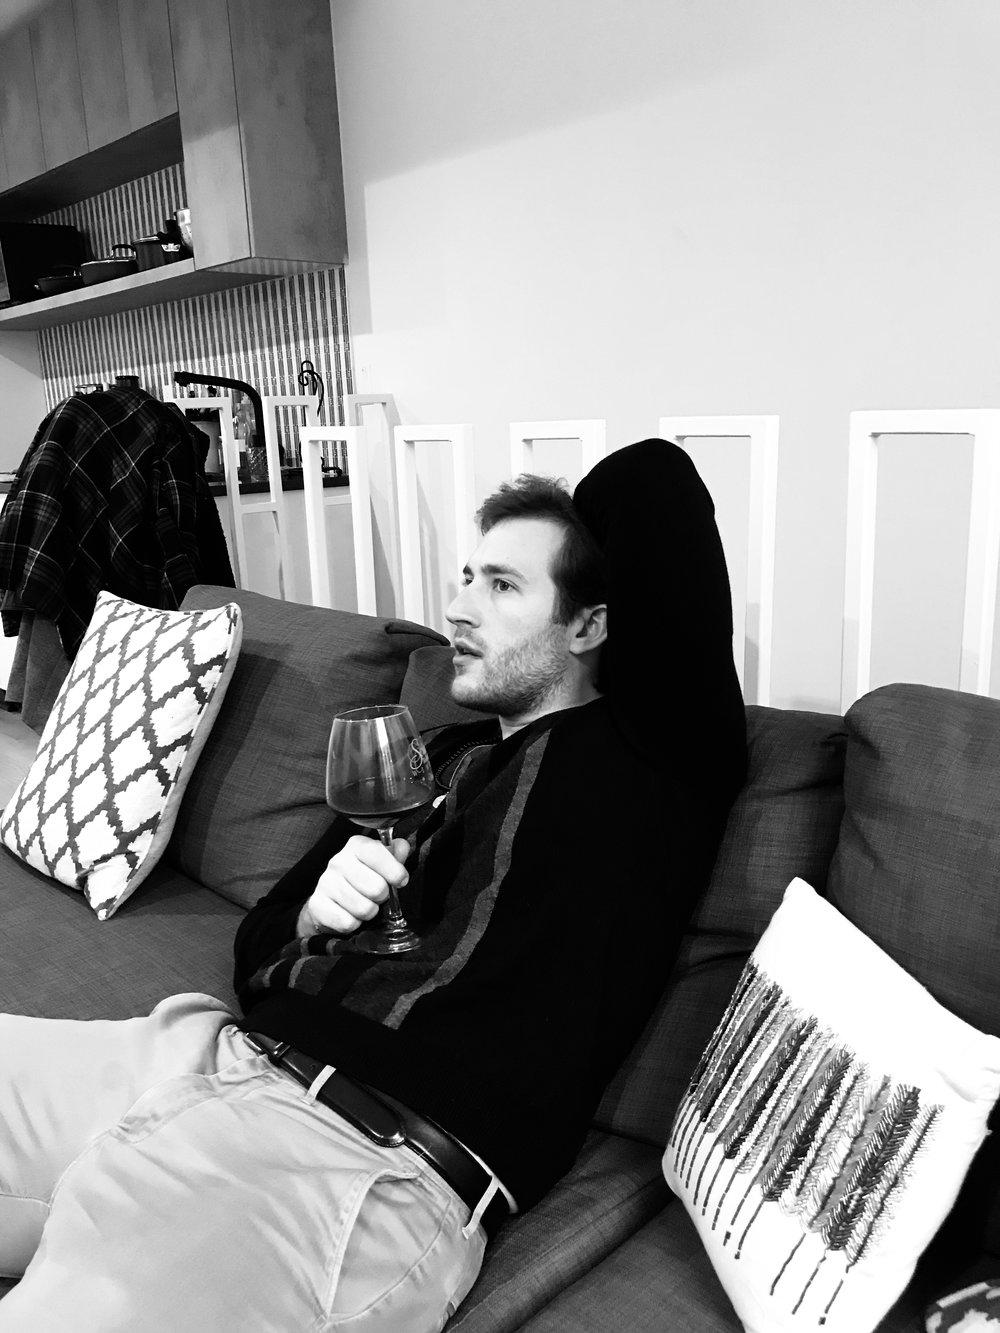 CHRIS GOEDEC - CREATOR OF JOYNEW MEMBER DEVELOPMENT @ WEWORK